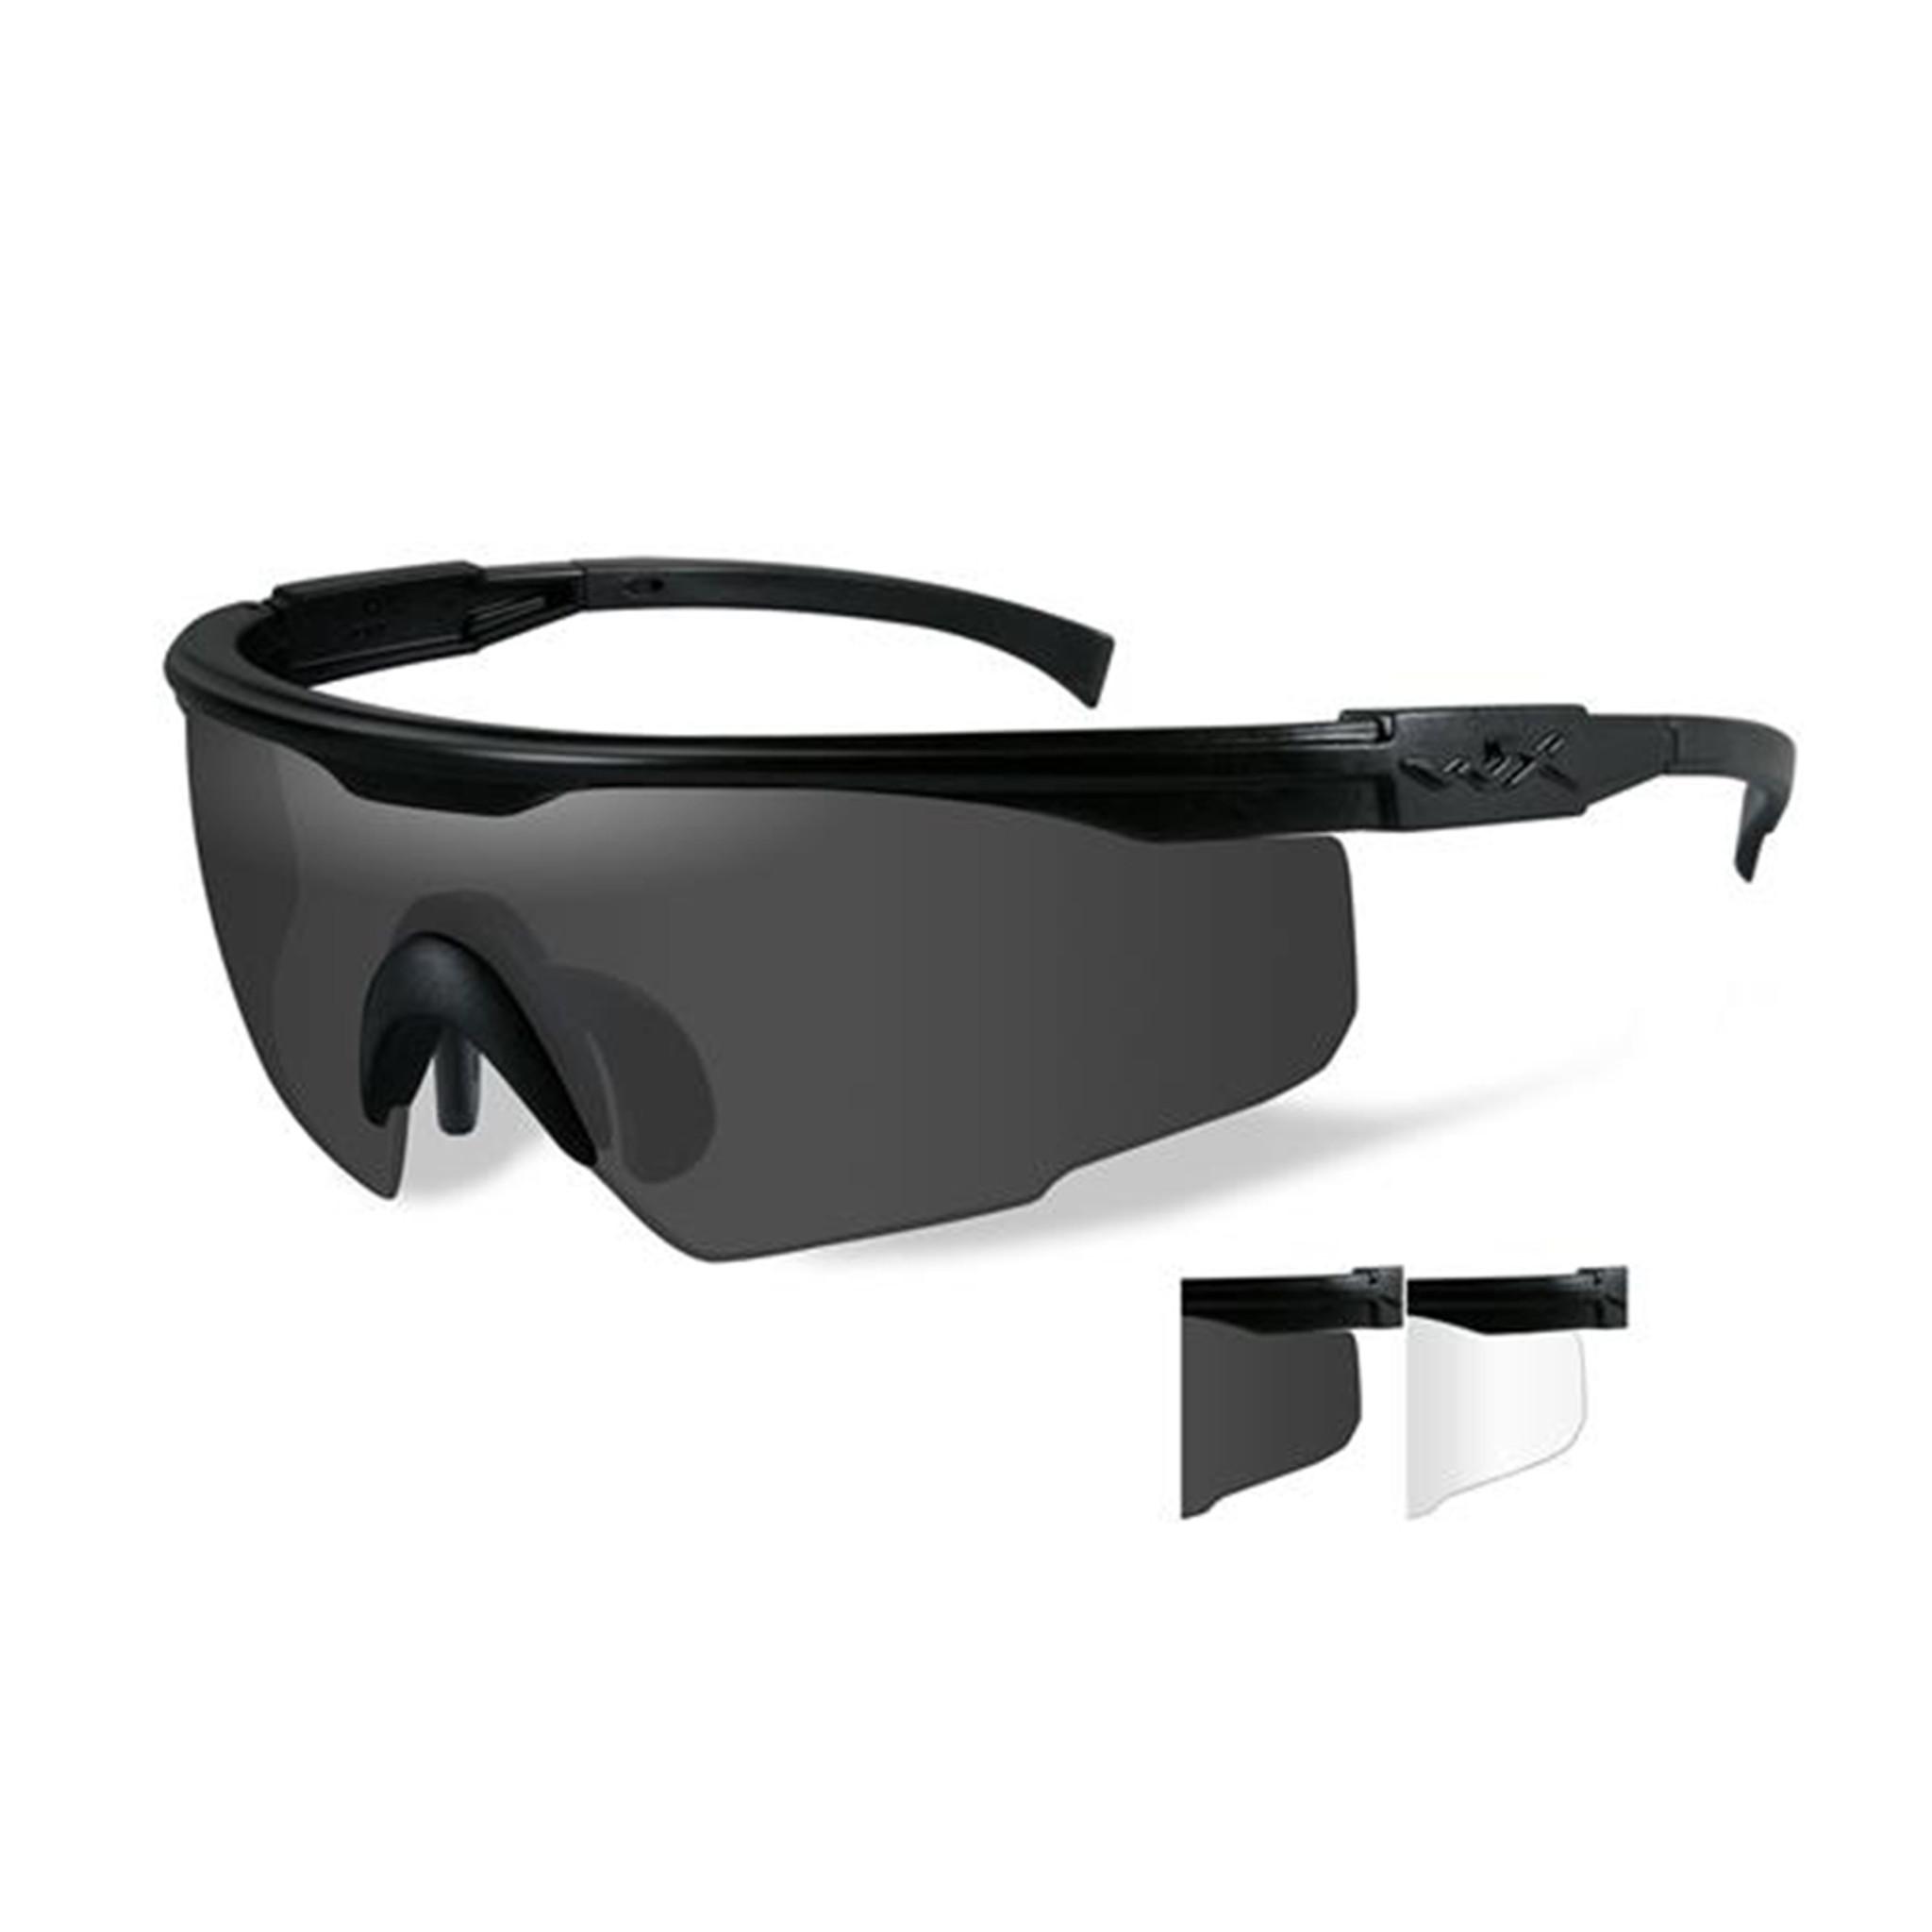 d89c542100 Wiley X PT-1SC - Wiley X Australia - Tactical Eyewear